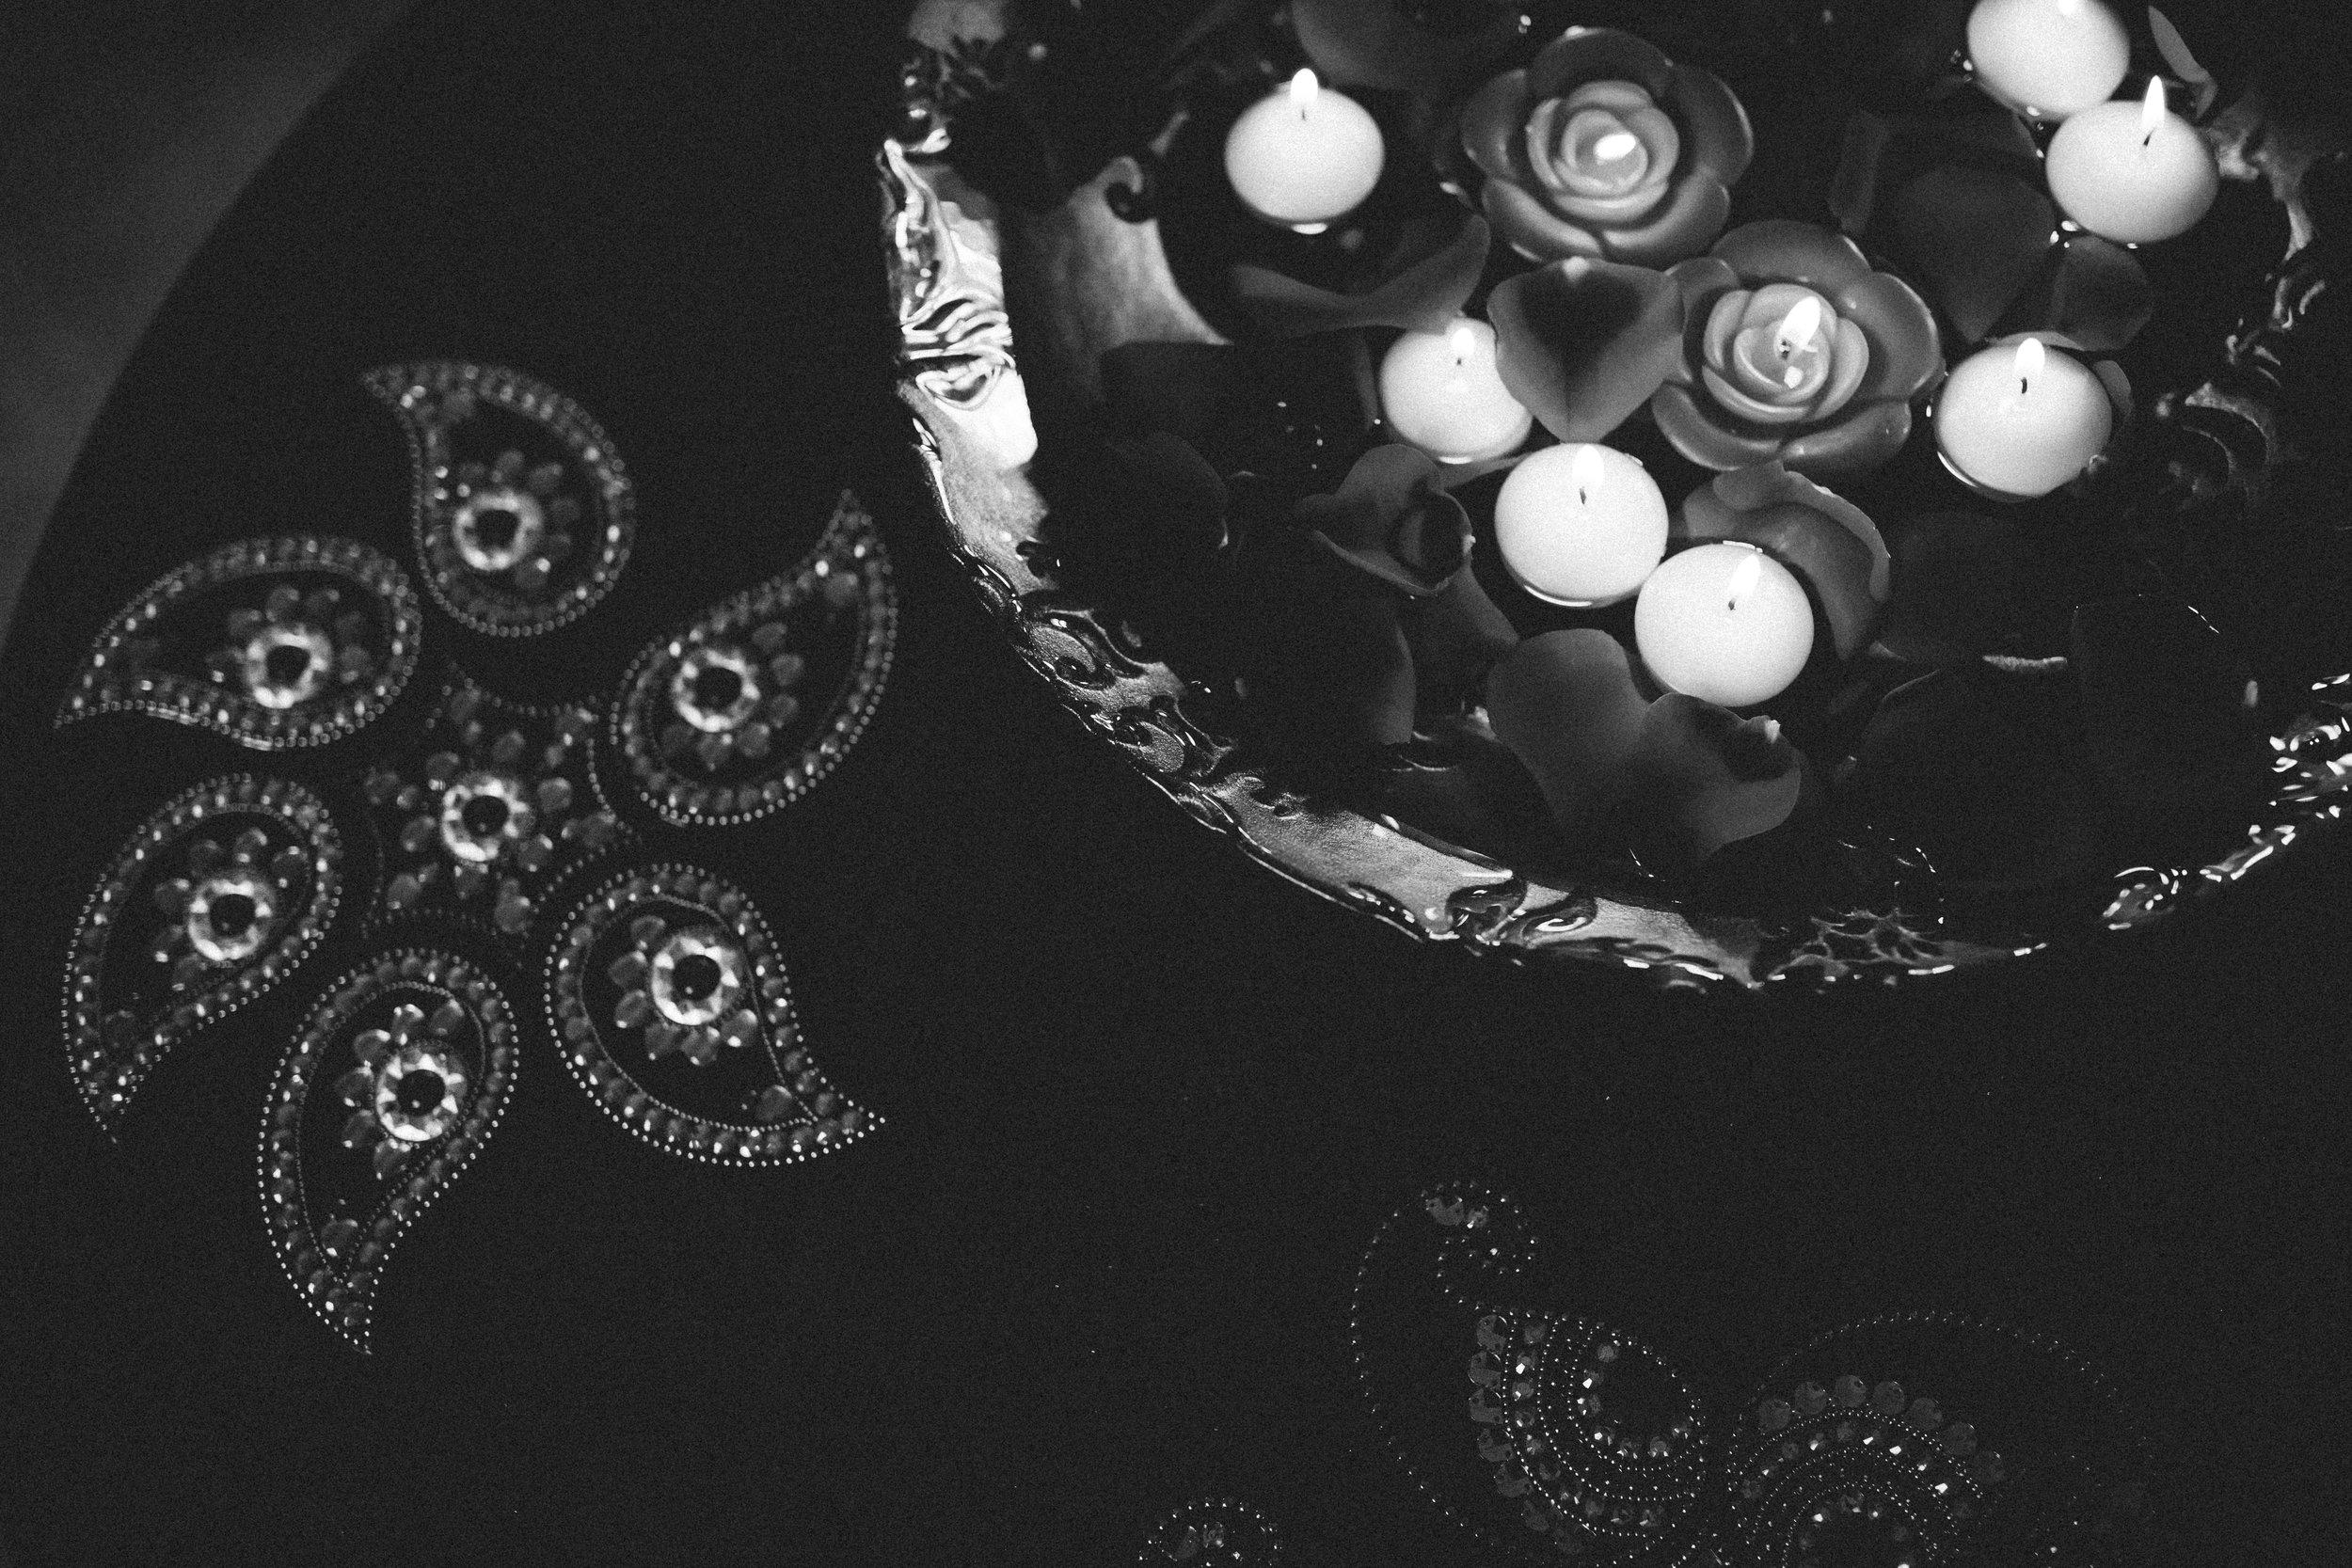 Aparna-Ankit-Patel-Mehndi-Wedding-Photos-0006.jpg